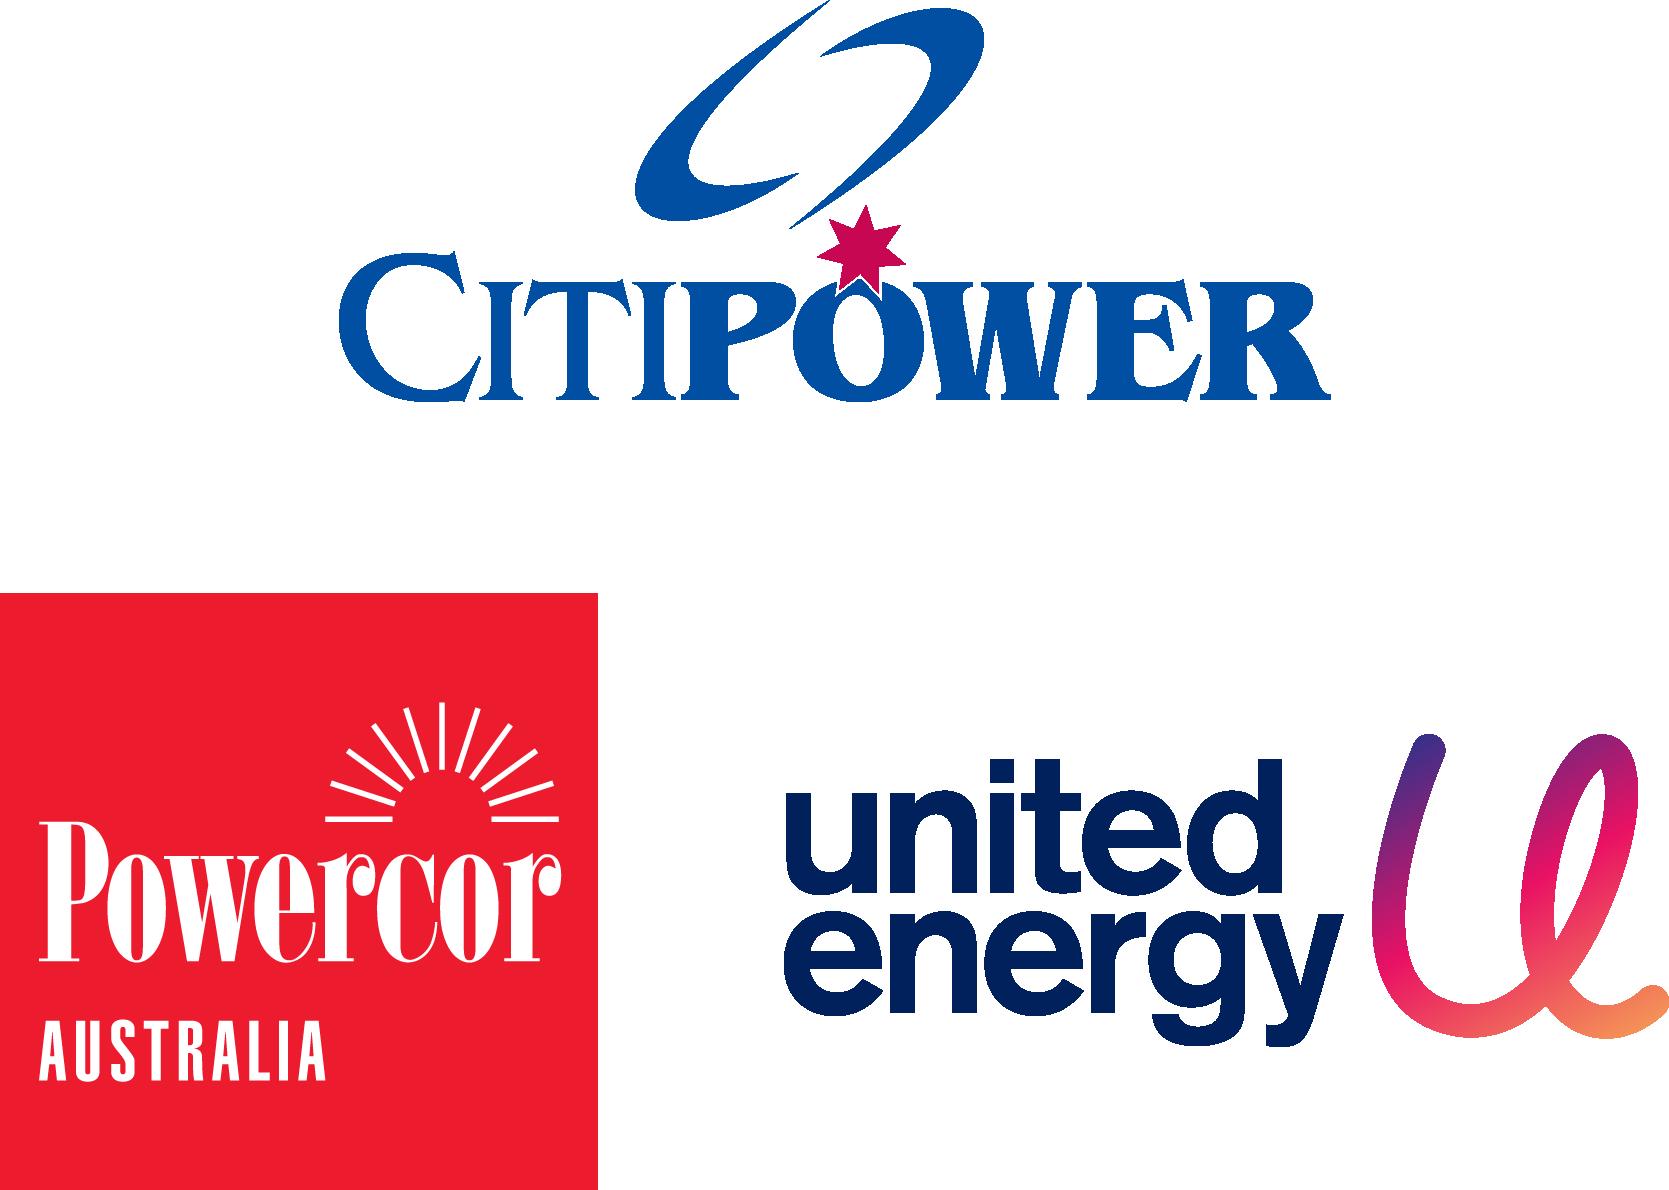 CitiPower Powercor United Energy Beon